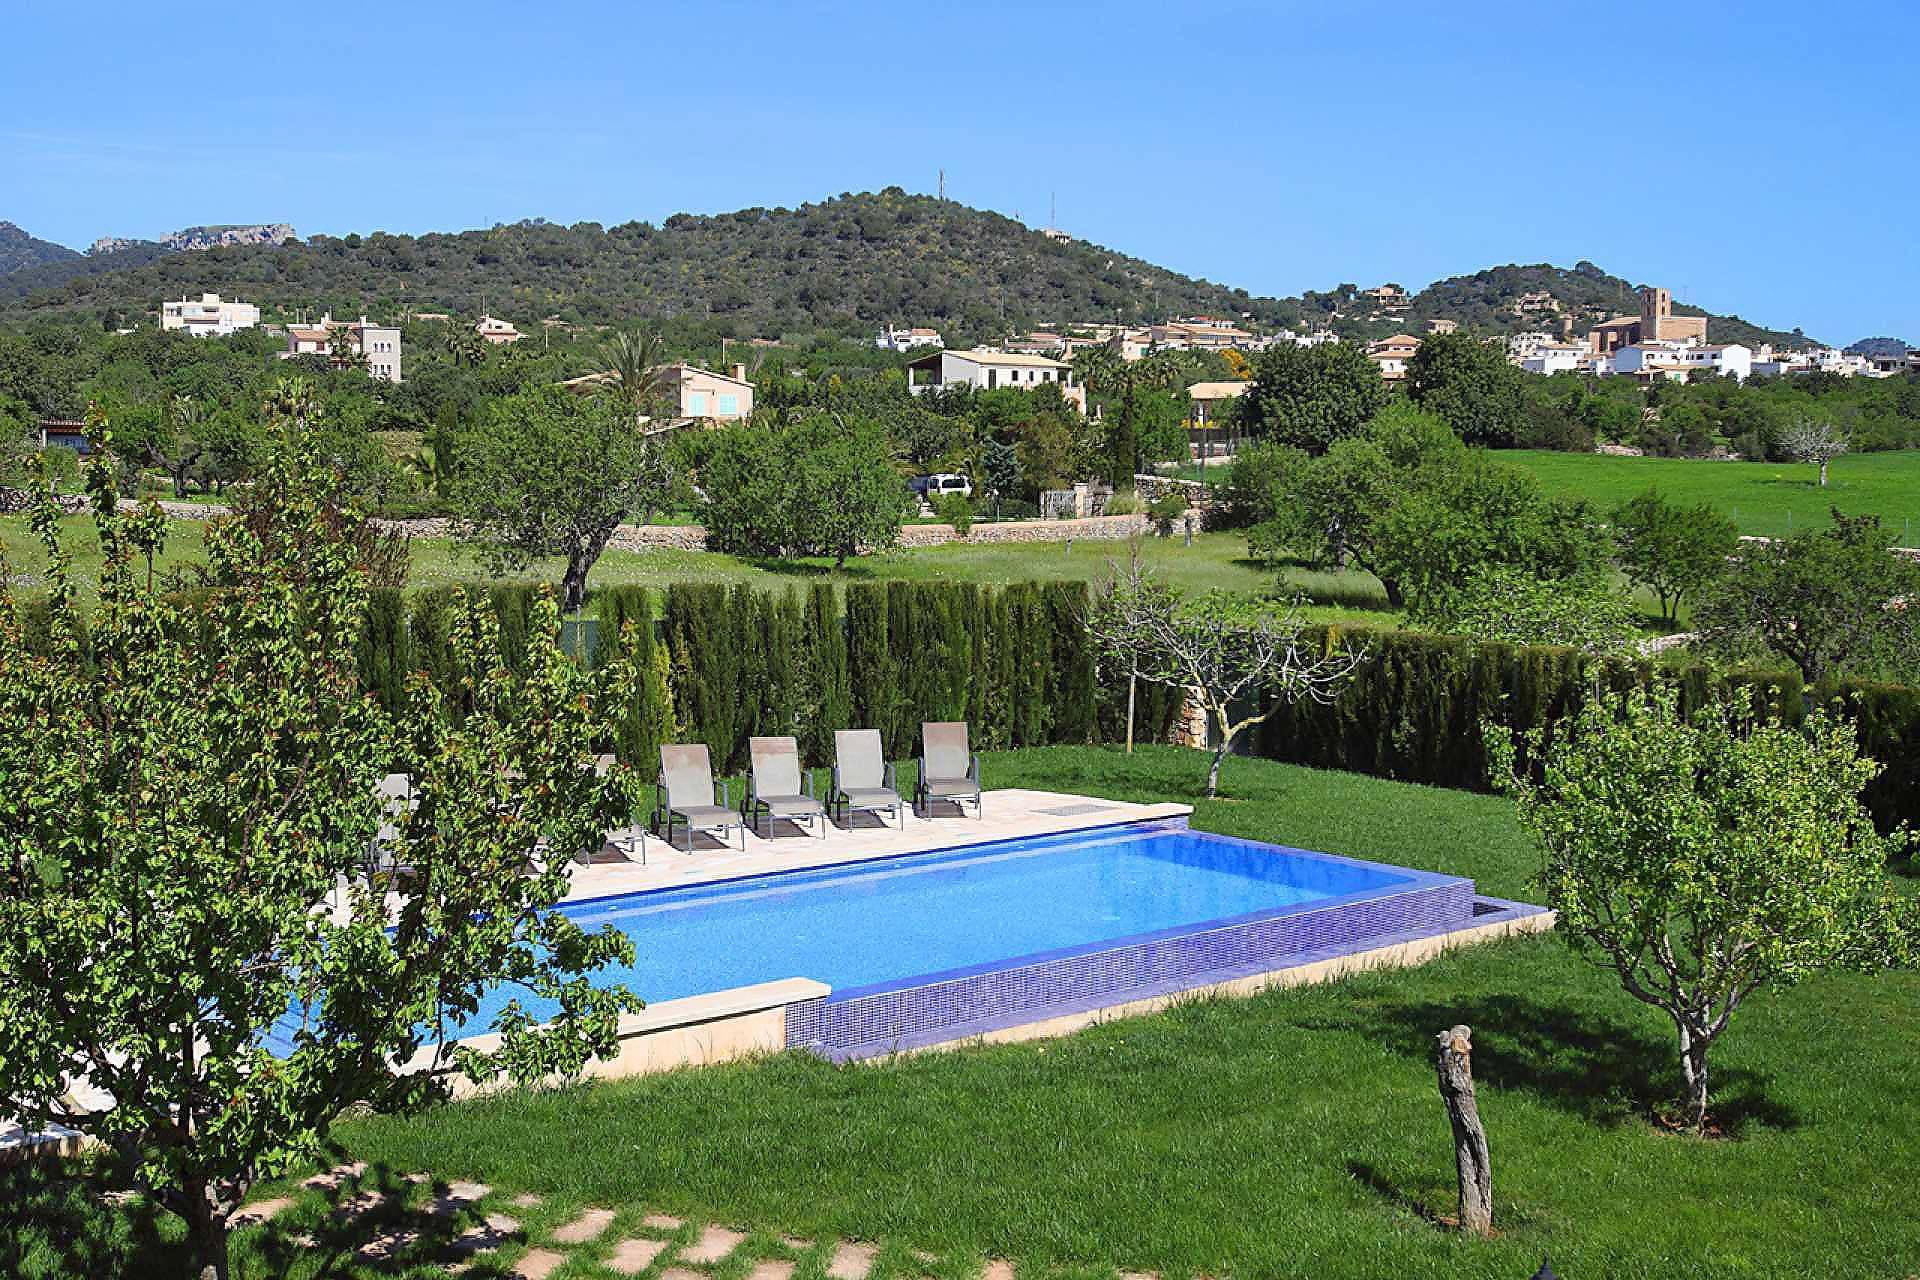 01-33 Großzügiges Ferienhaus Mallorca Osten Bild 4